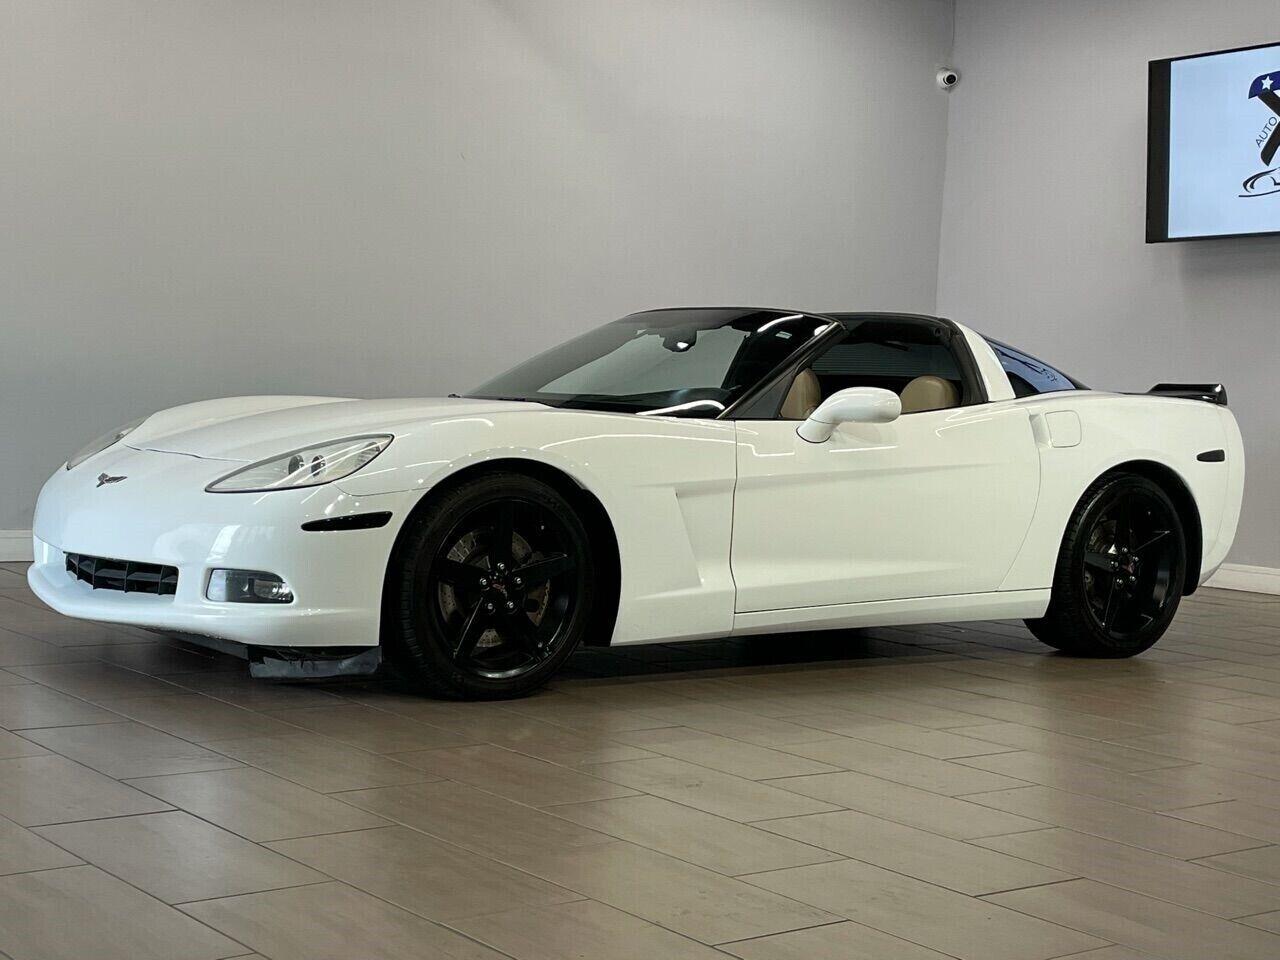 2007 White Chevrolet Corvette Coupe  | C6 Corvette Photo 3